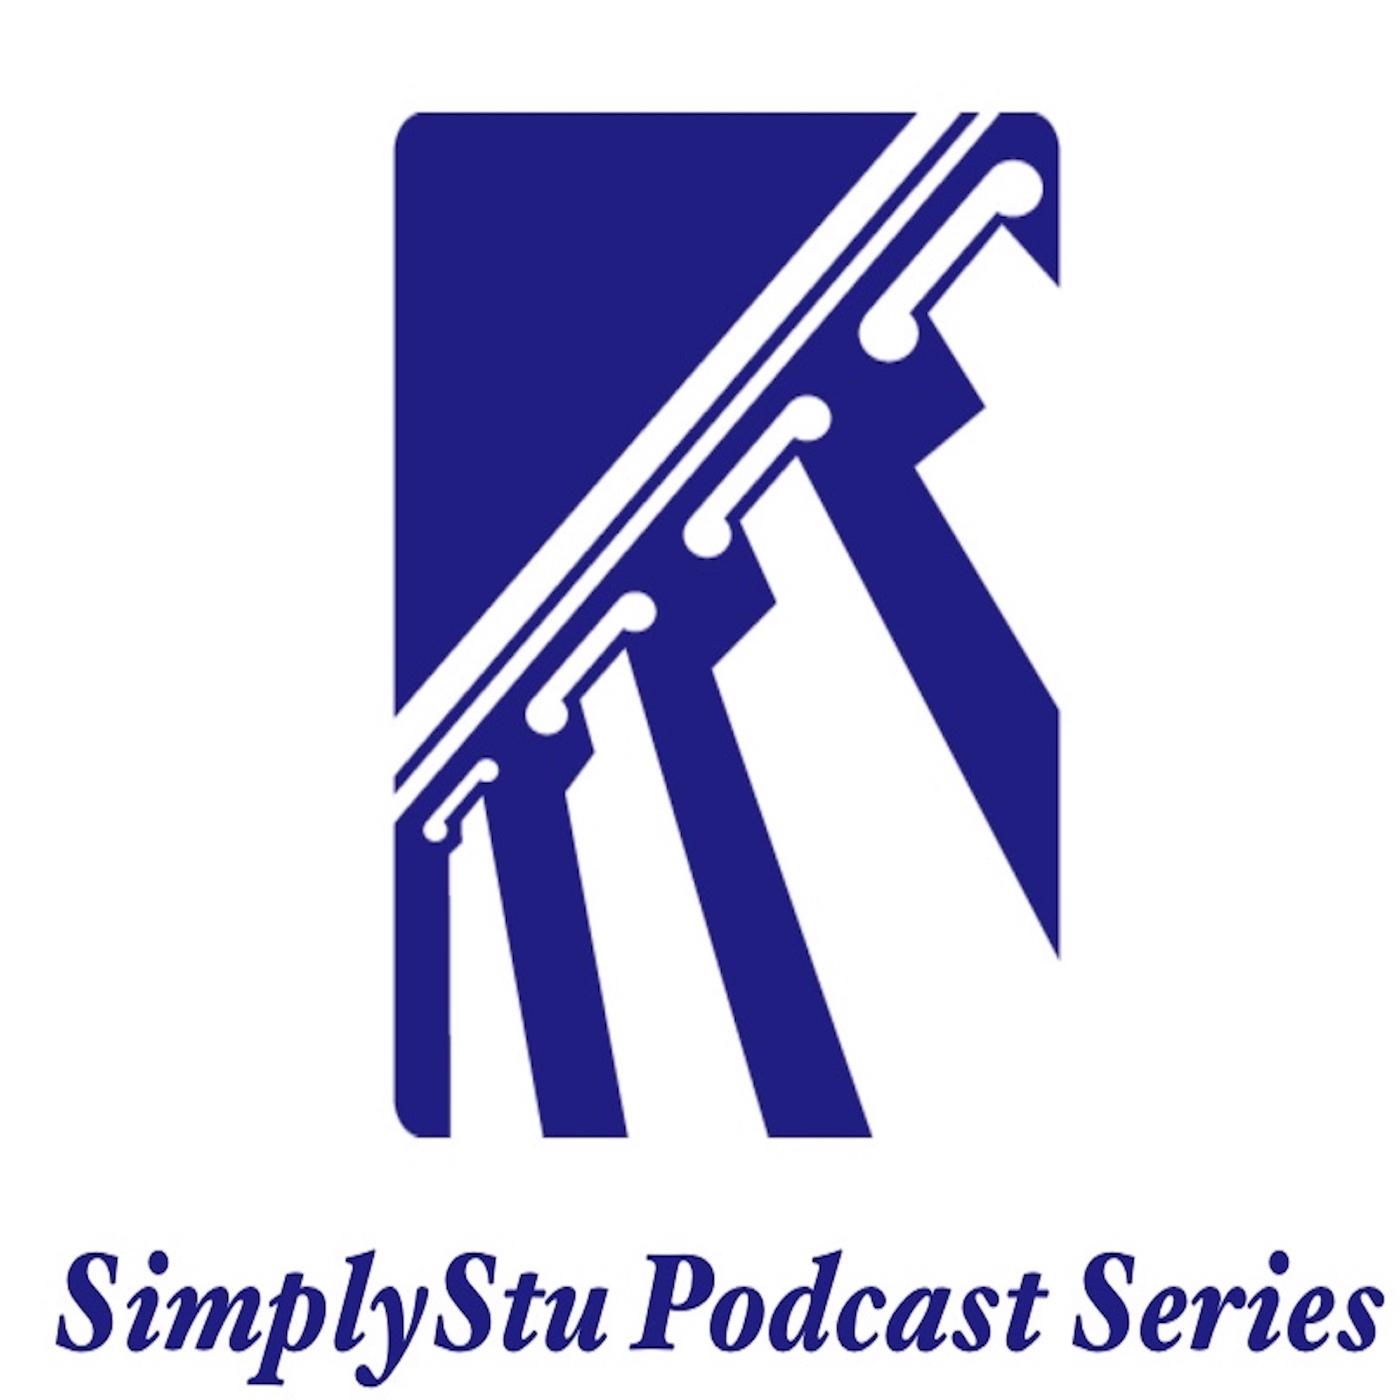 SimplyStu Podcast Series show art